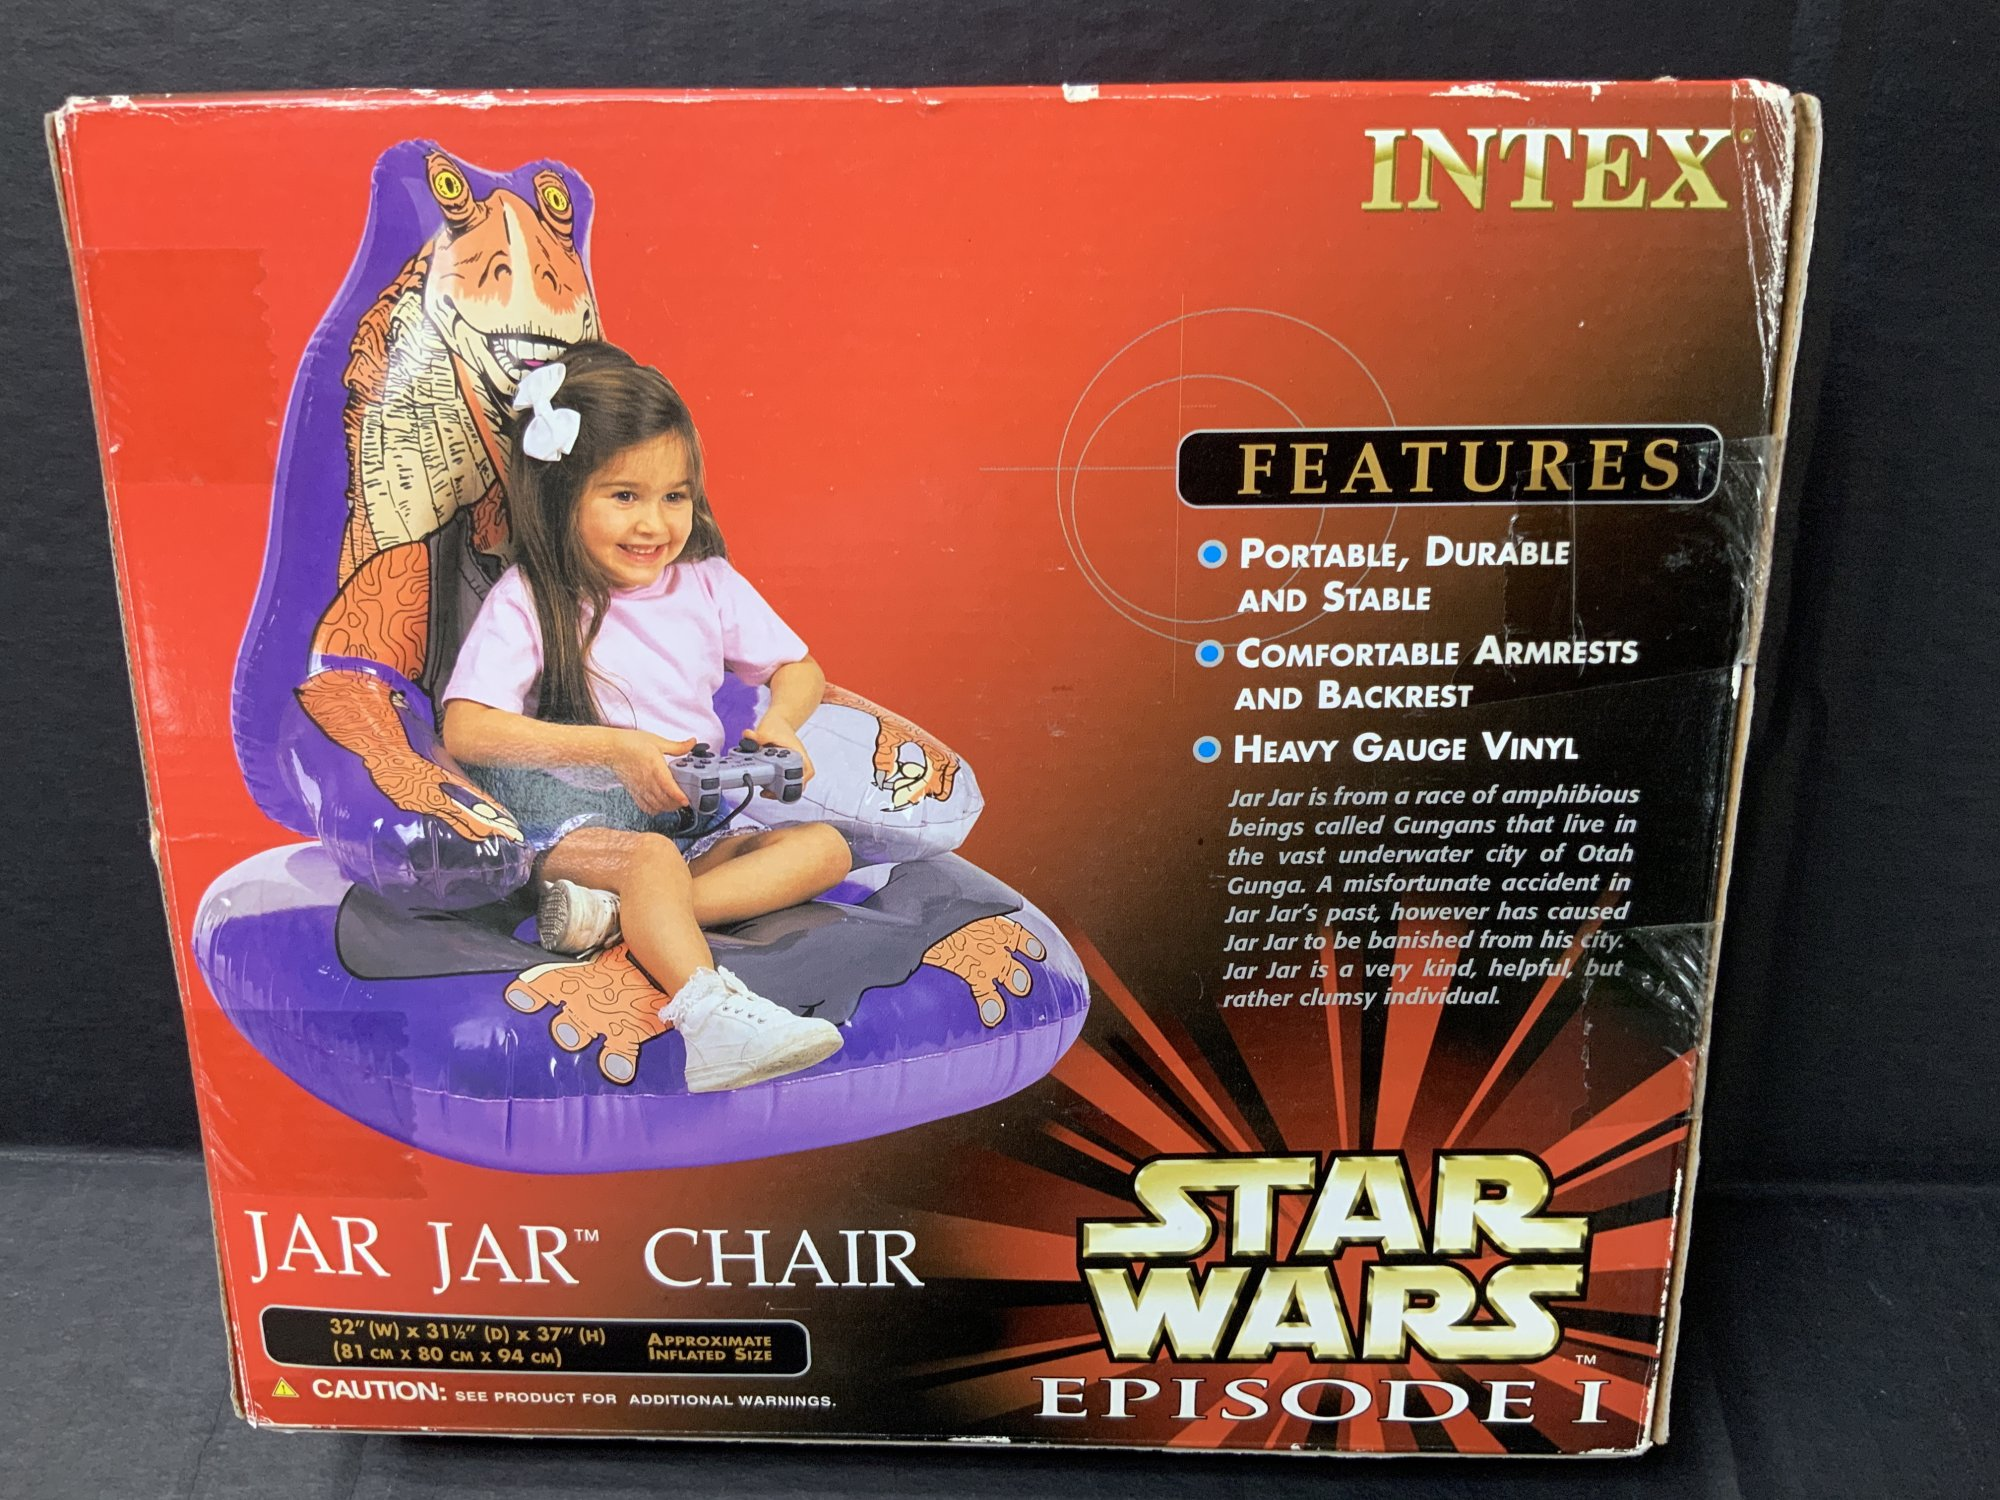 Intex Star Wars Episode I Jar Jar Inflatable Chair